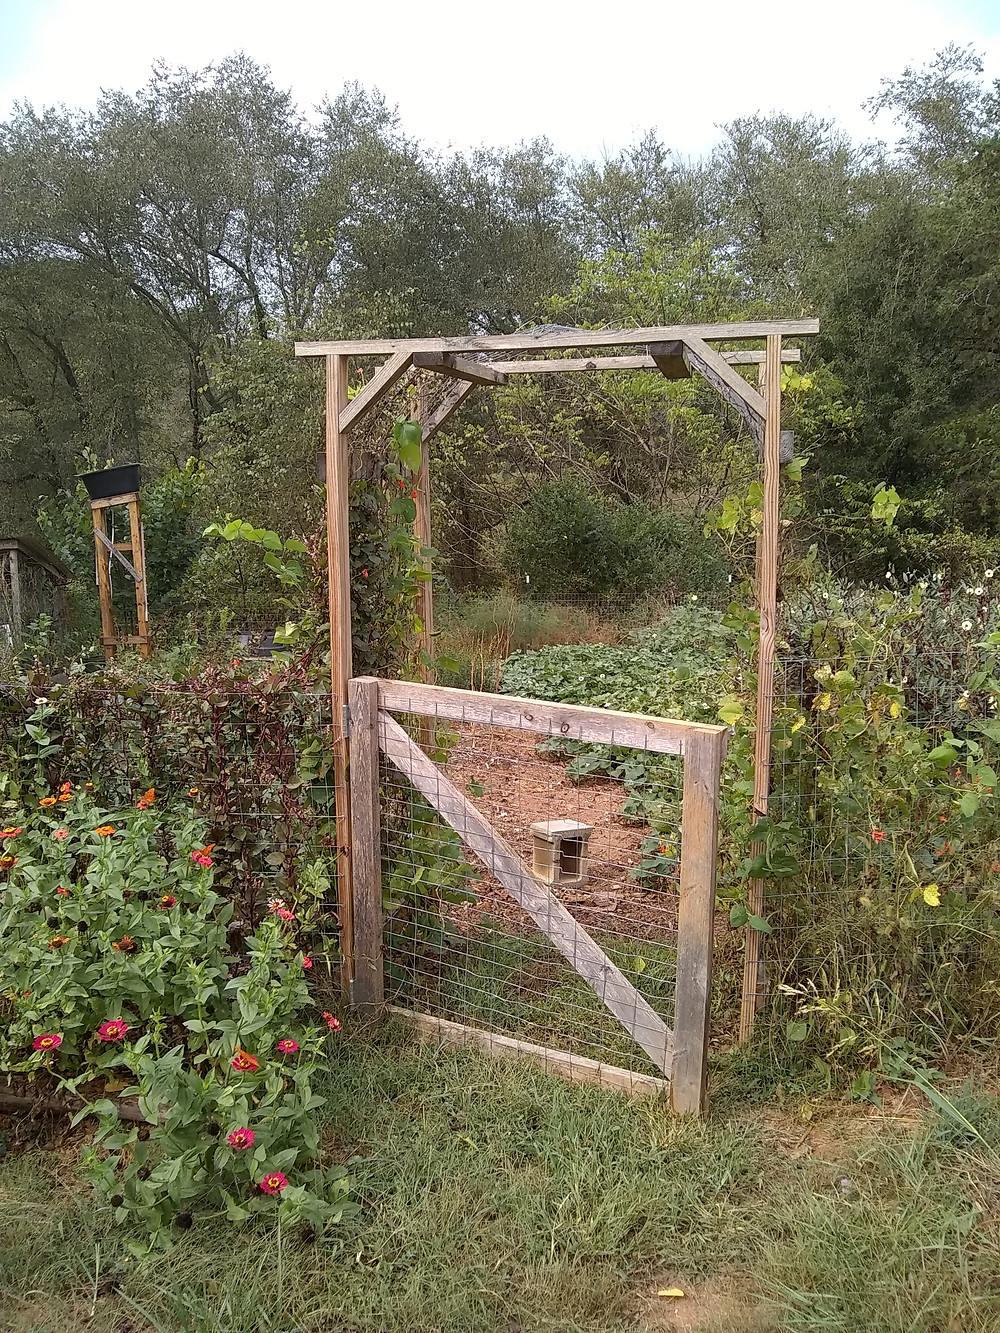 Garden gate with a solar garden shower